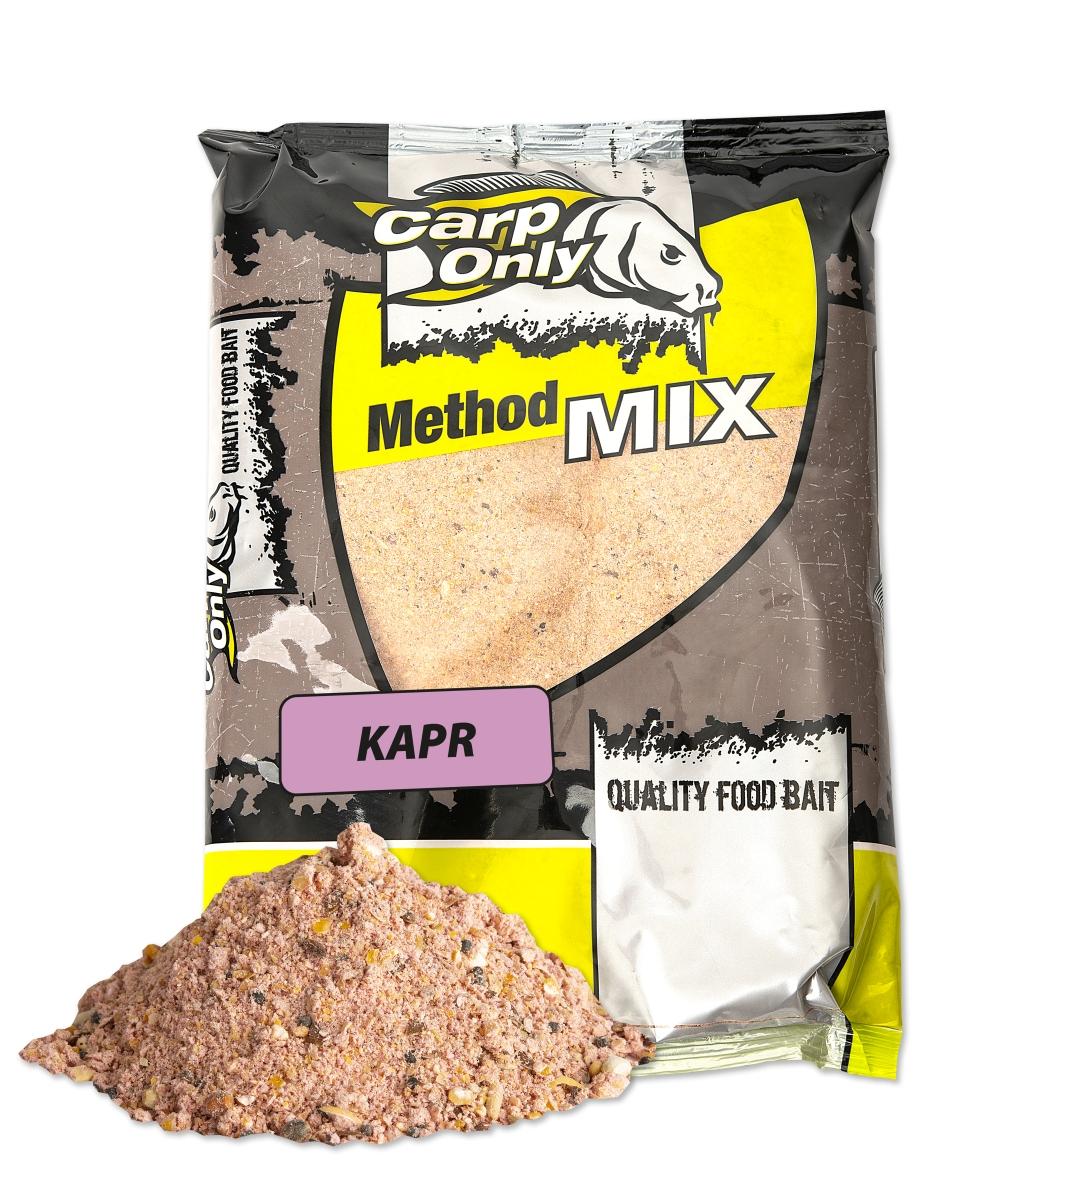 Method mix Carp Only Carp 1kg